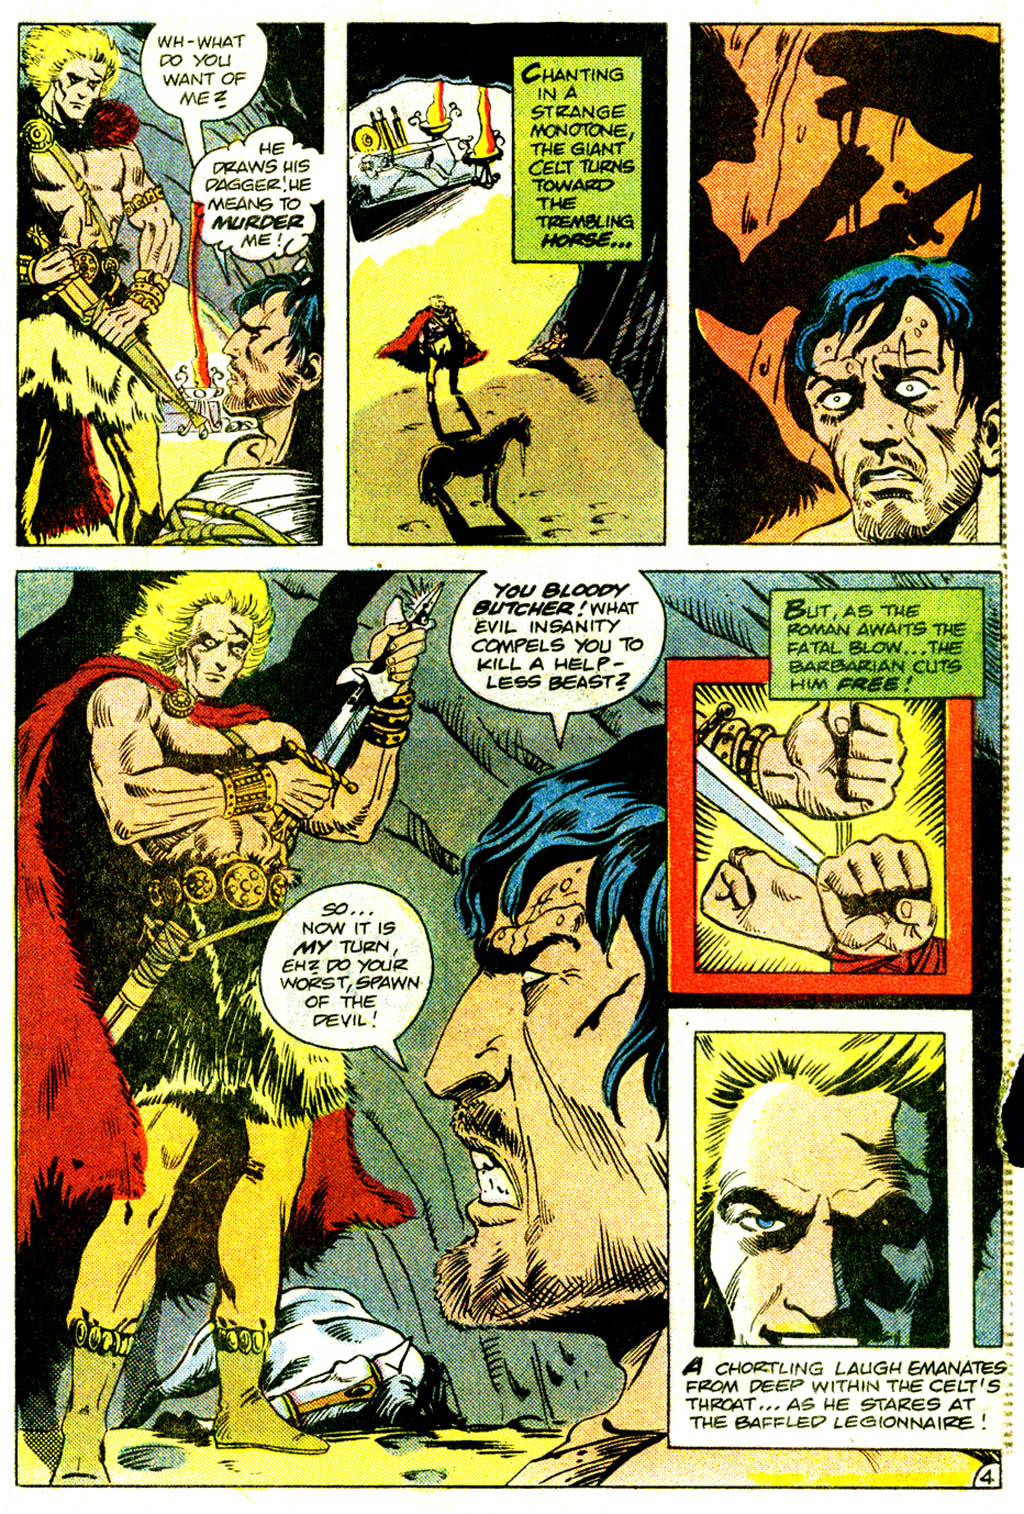 Read online Sgt. Rock comic -  Issue #362 - 26